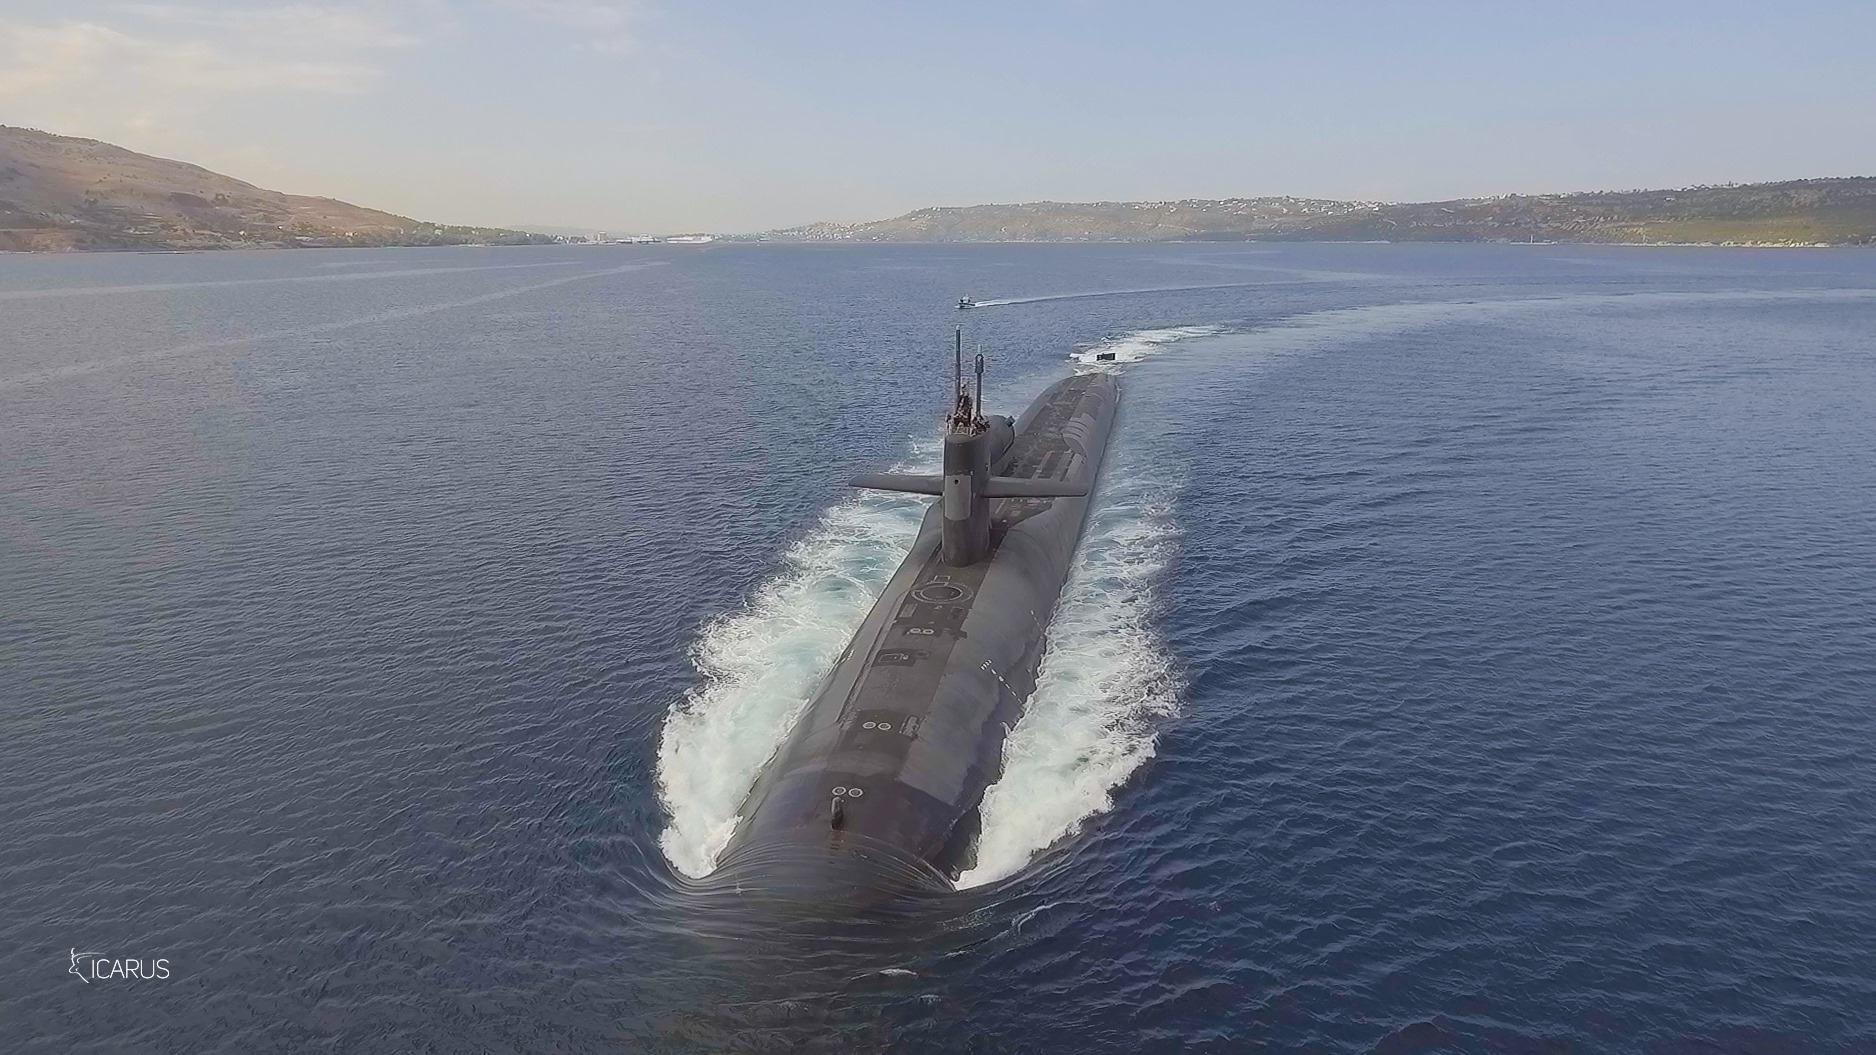 Dji Phantom 4 Captures Nuclear Powered Submarine Uss